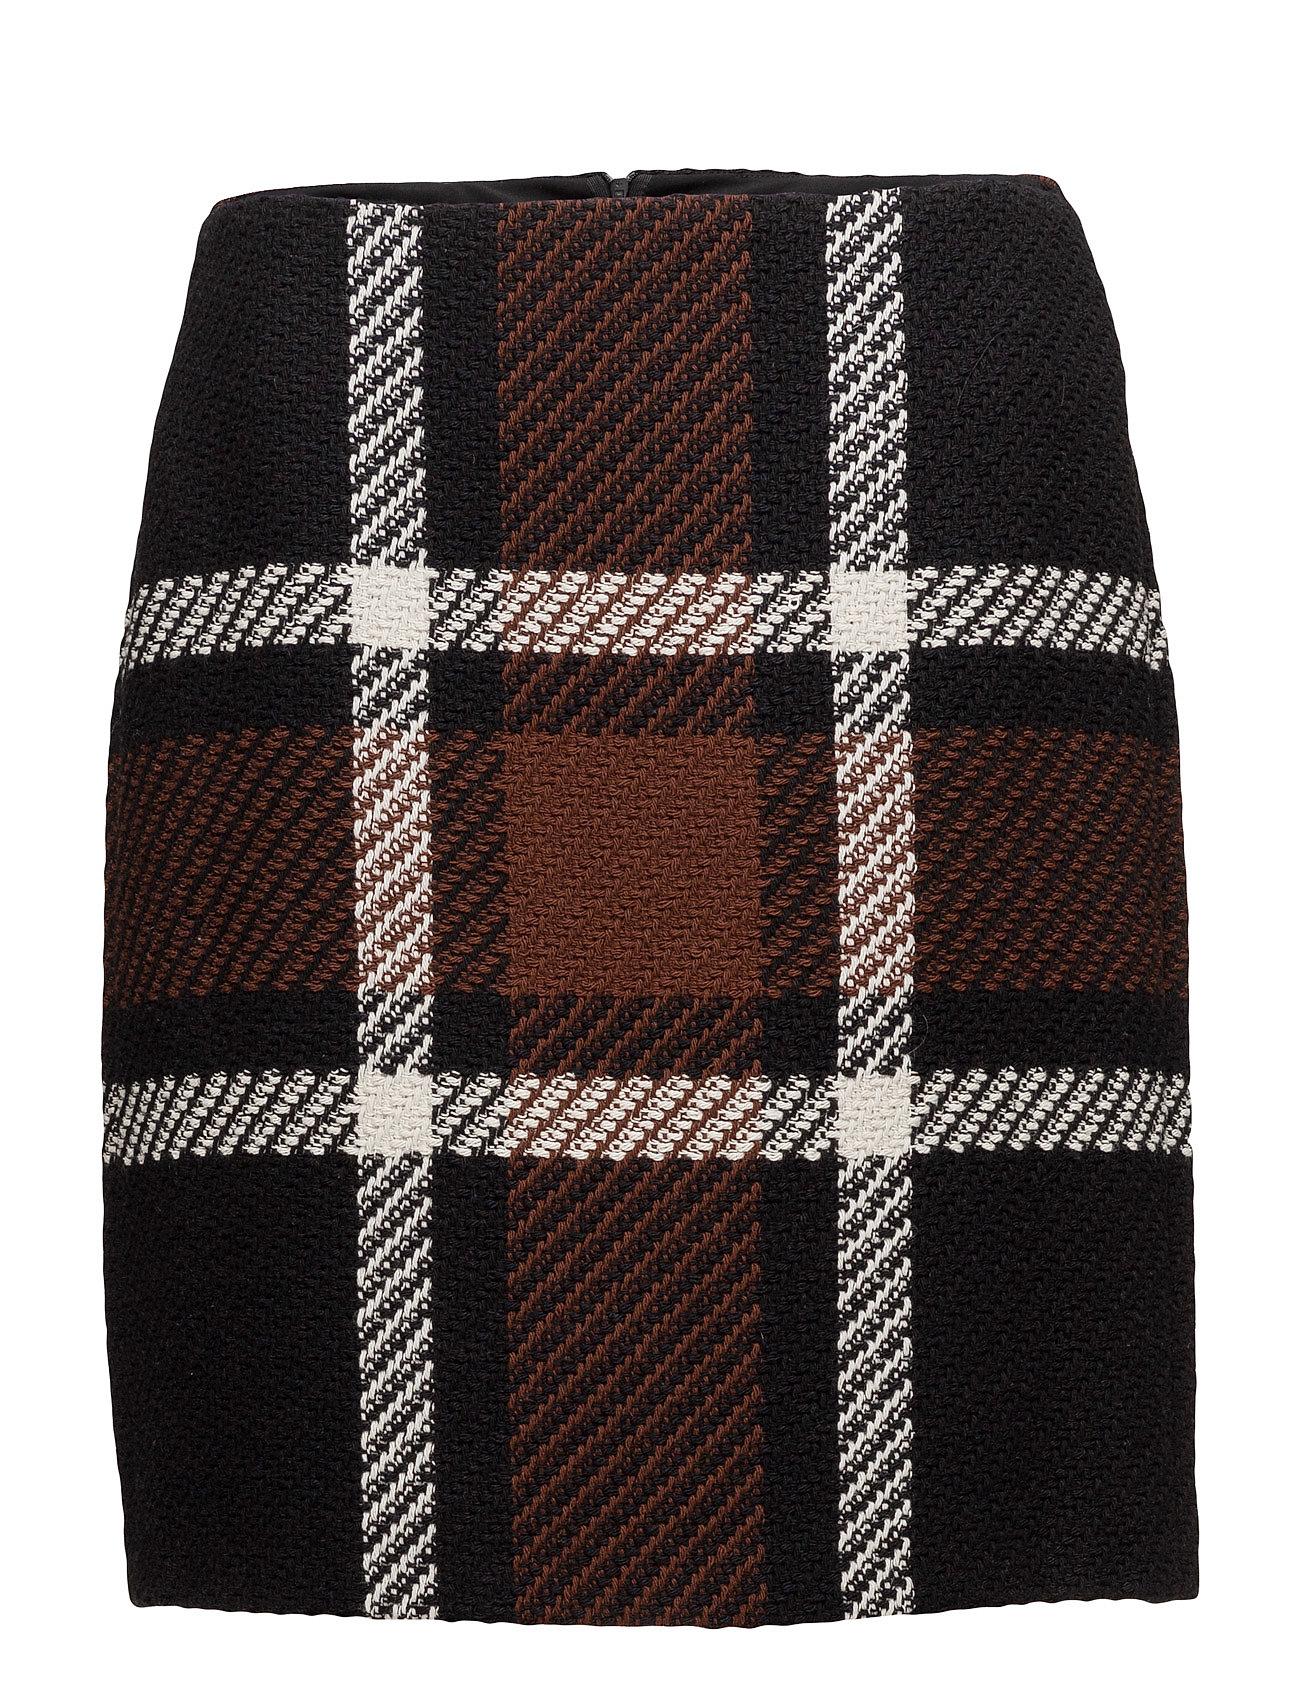 Skirt short woven fa fra taifun på boozt.com dk